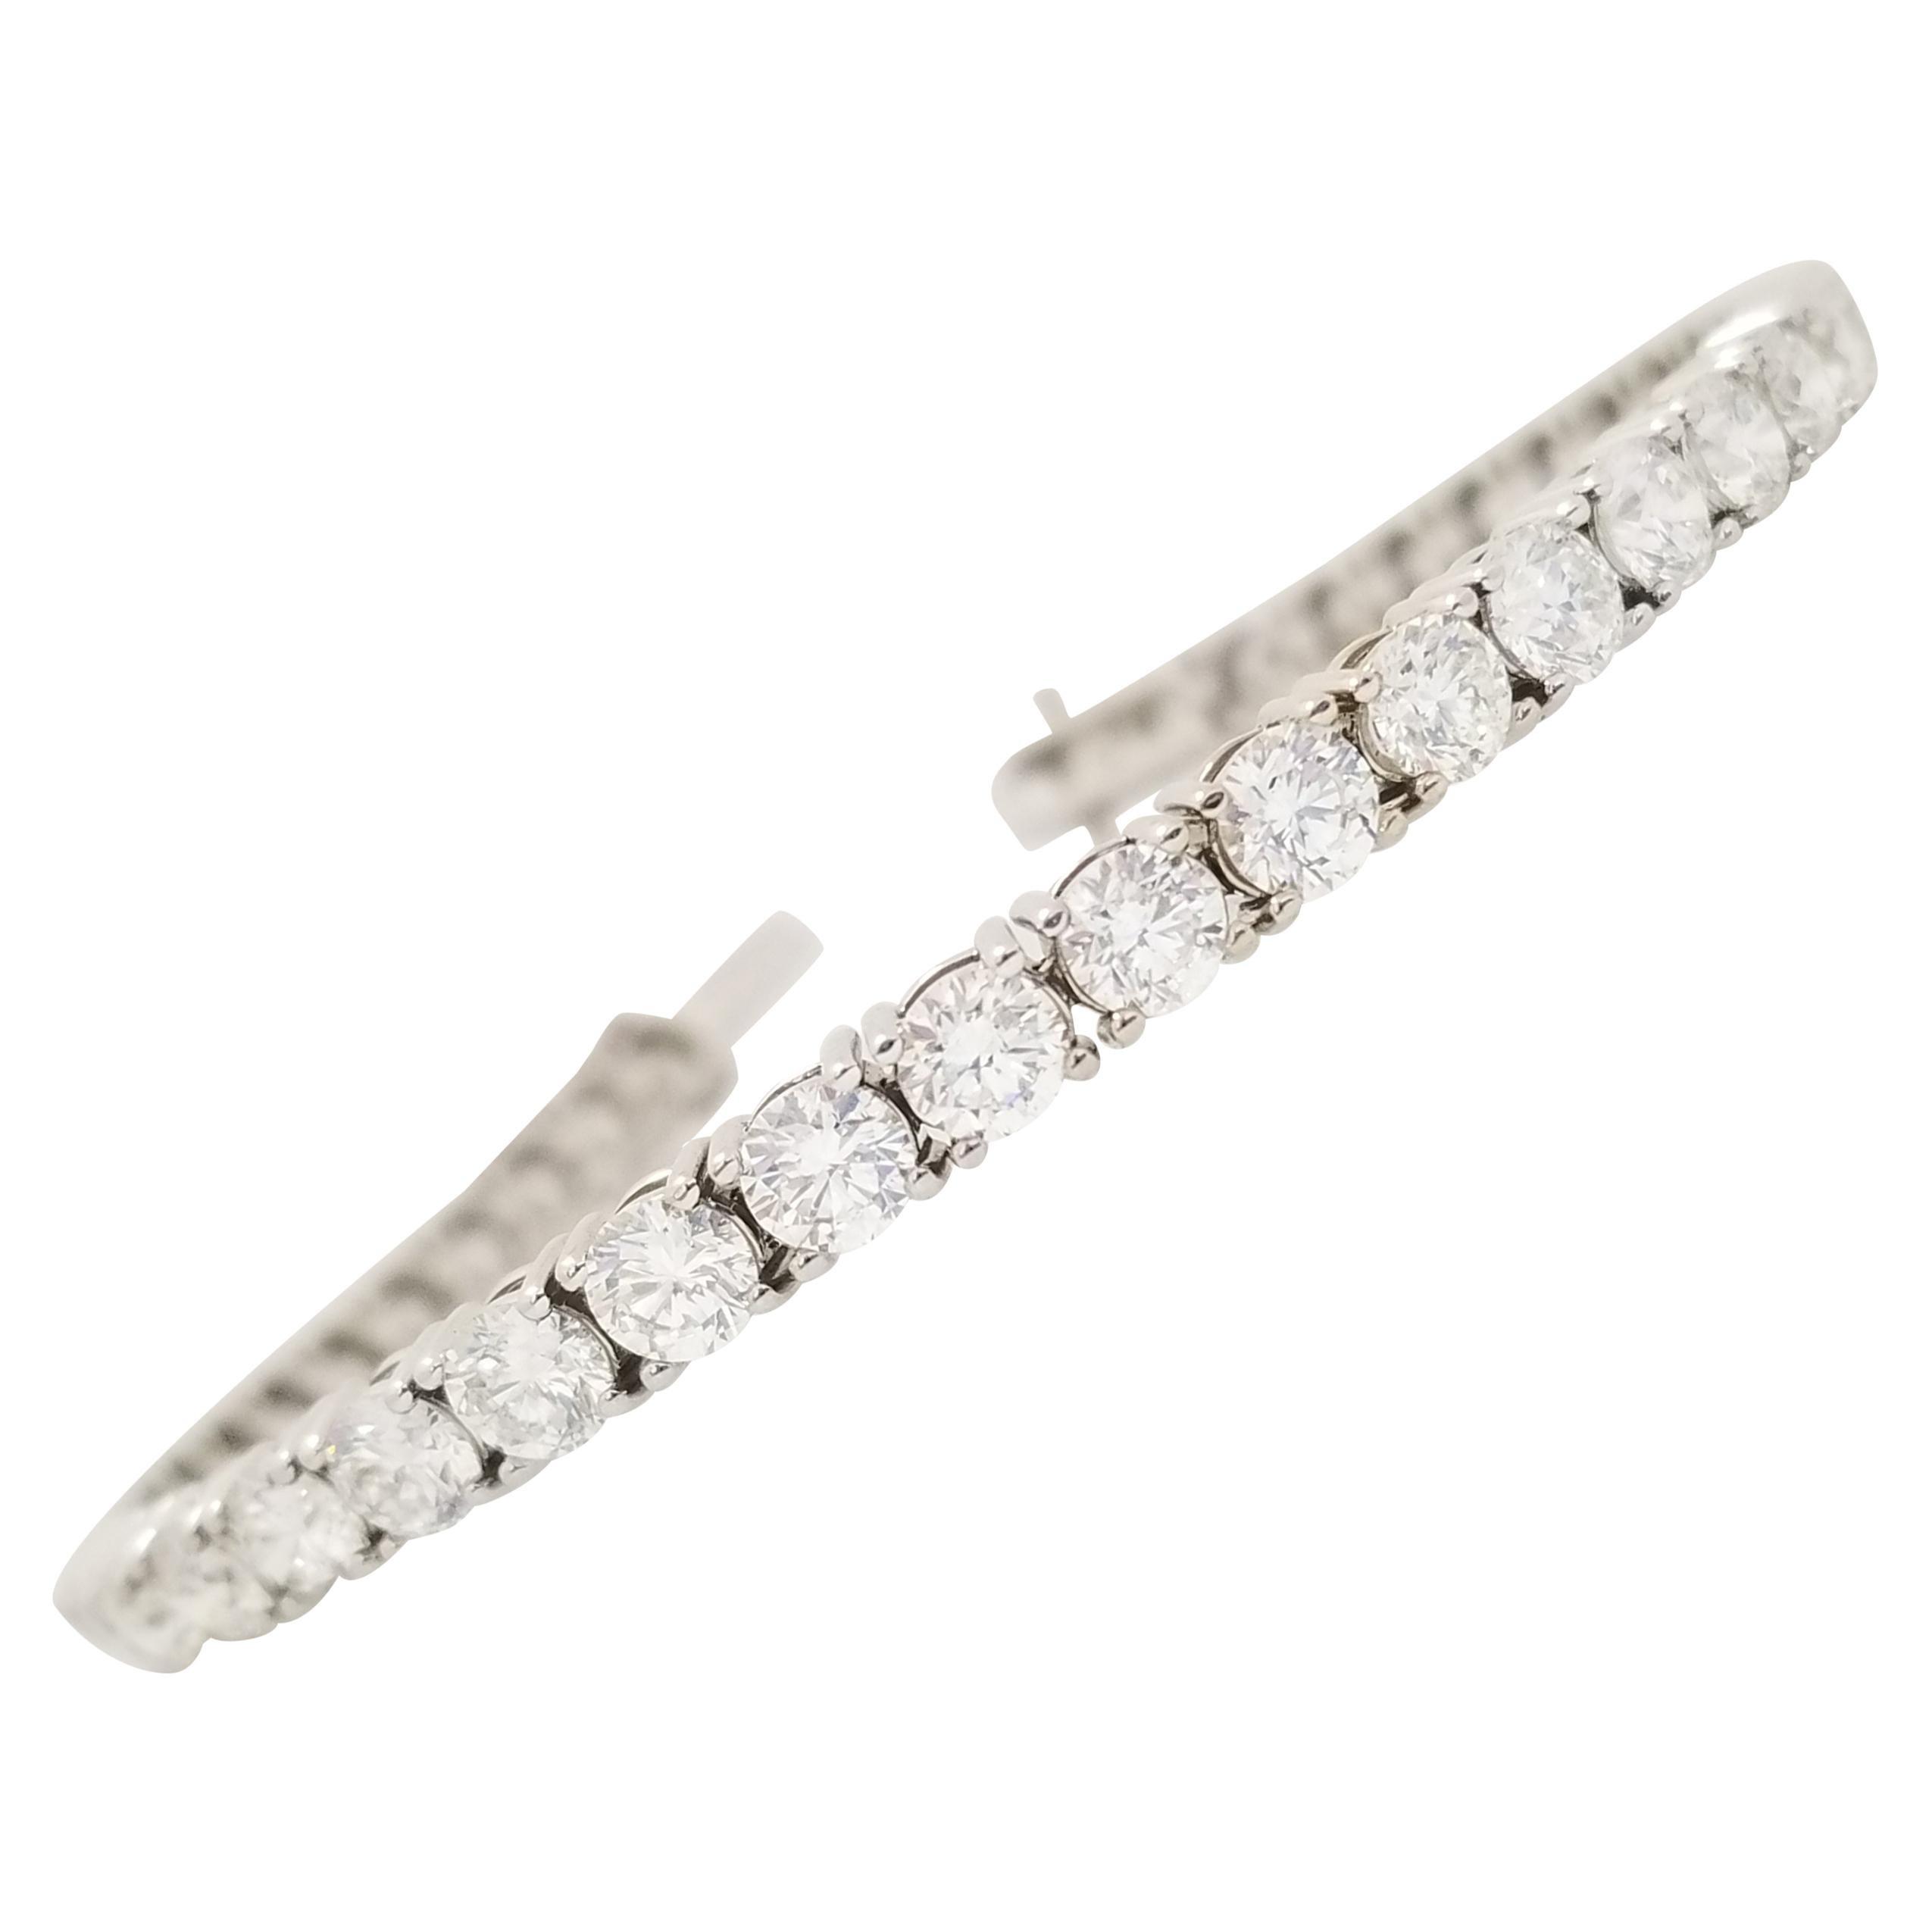 9.85 Carat Round Brilliant Cut Diamond Tennis Bracelet 14 Karat White Gold